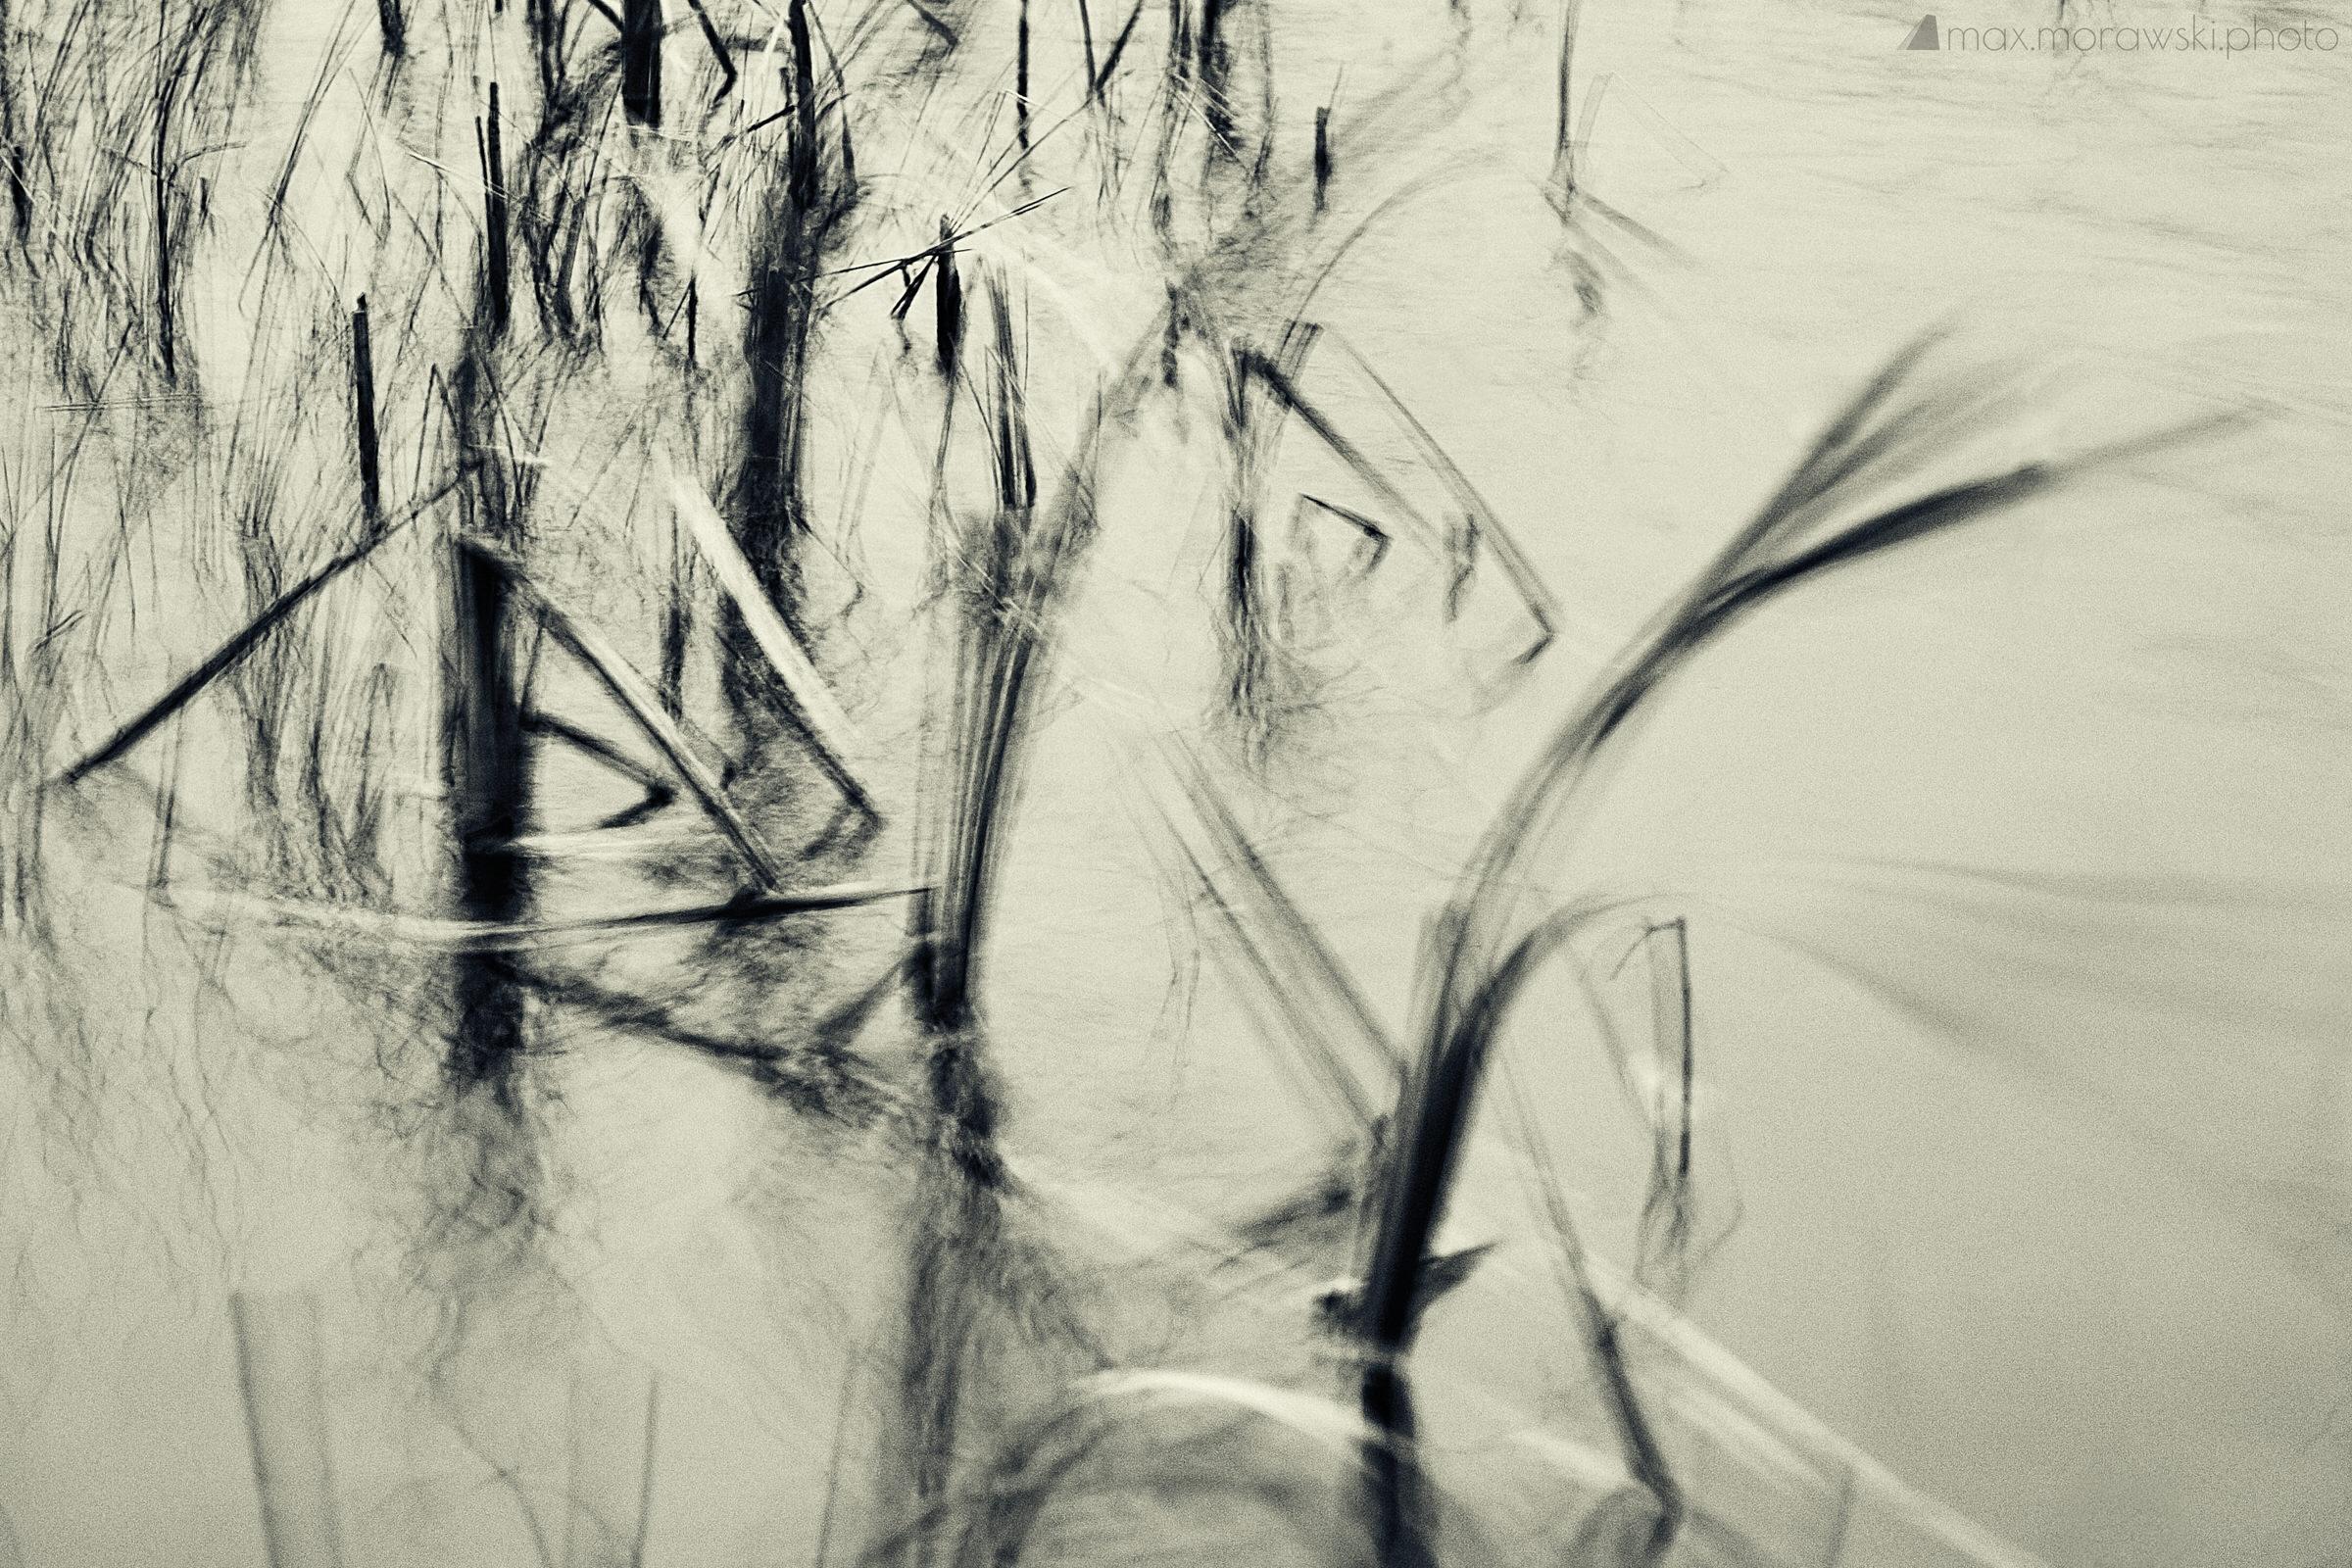 November Reeds; Charcoal study #6